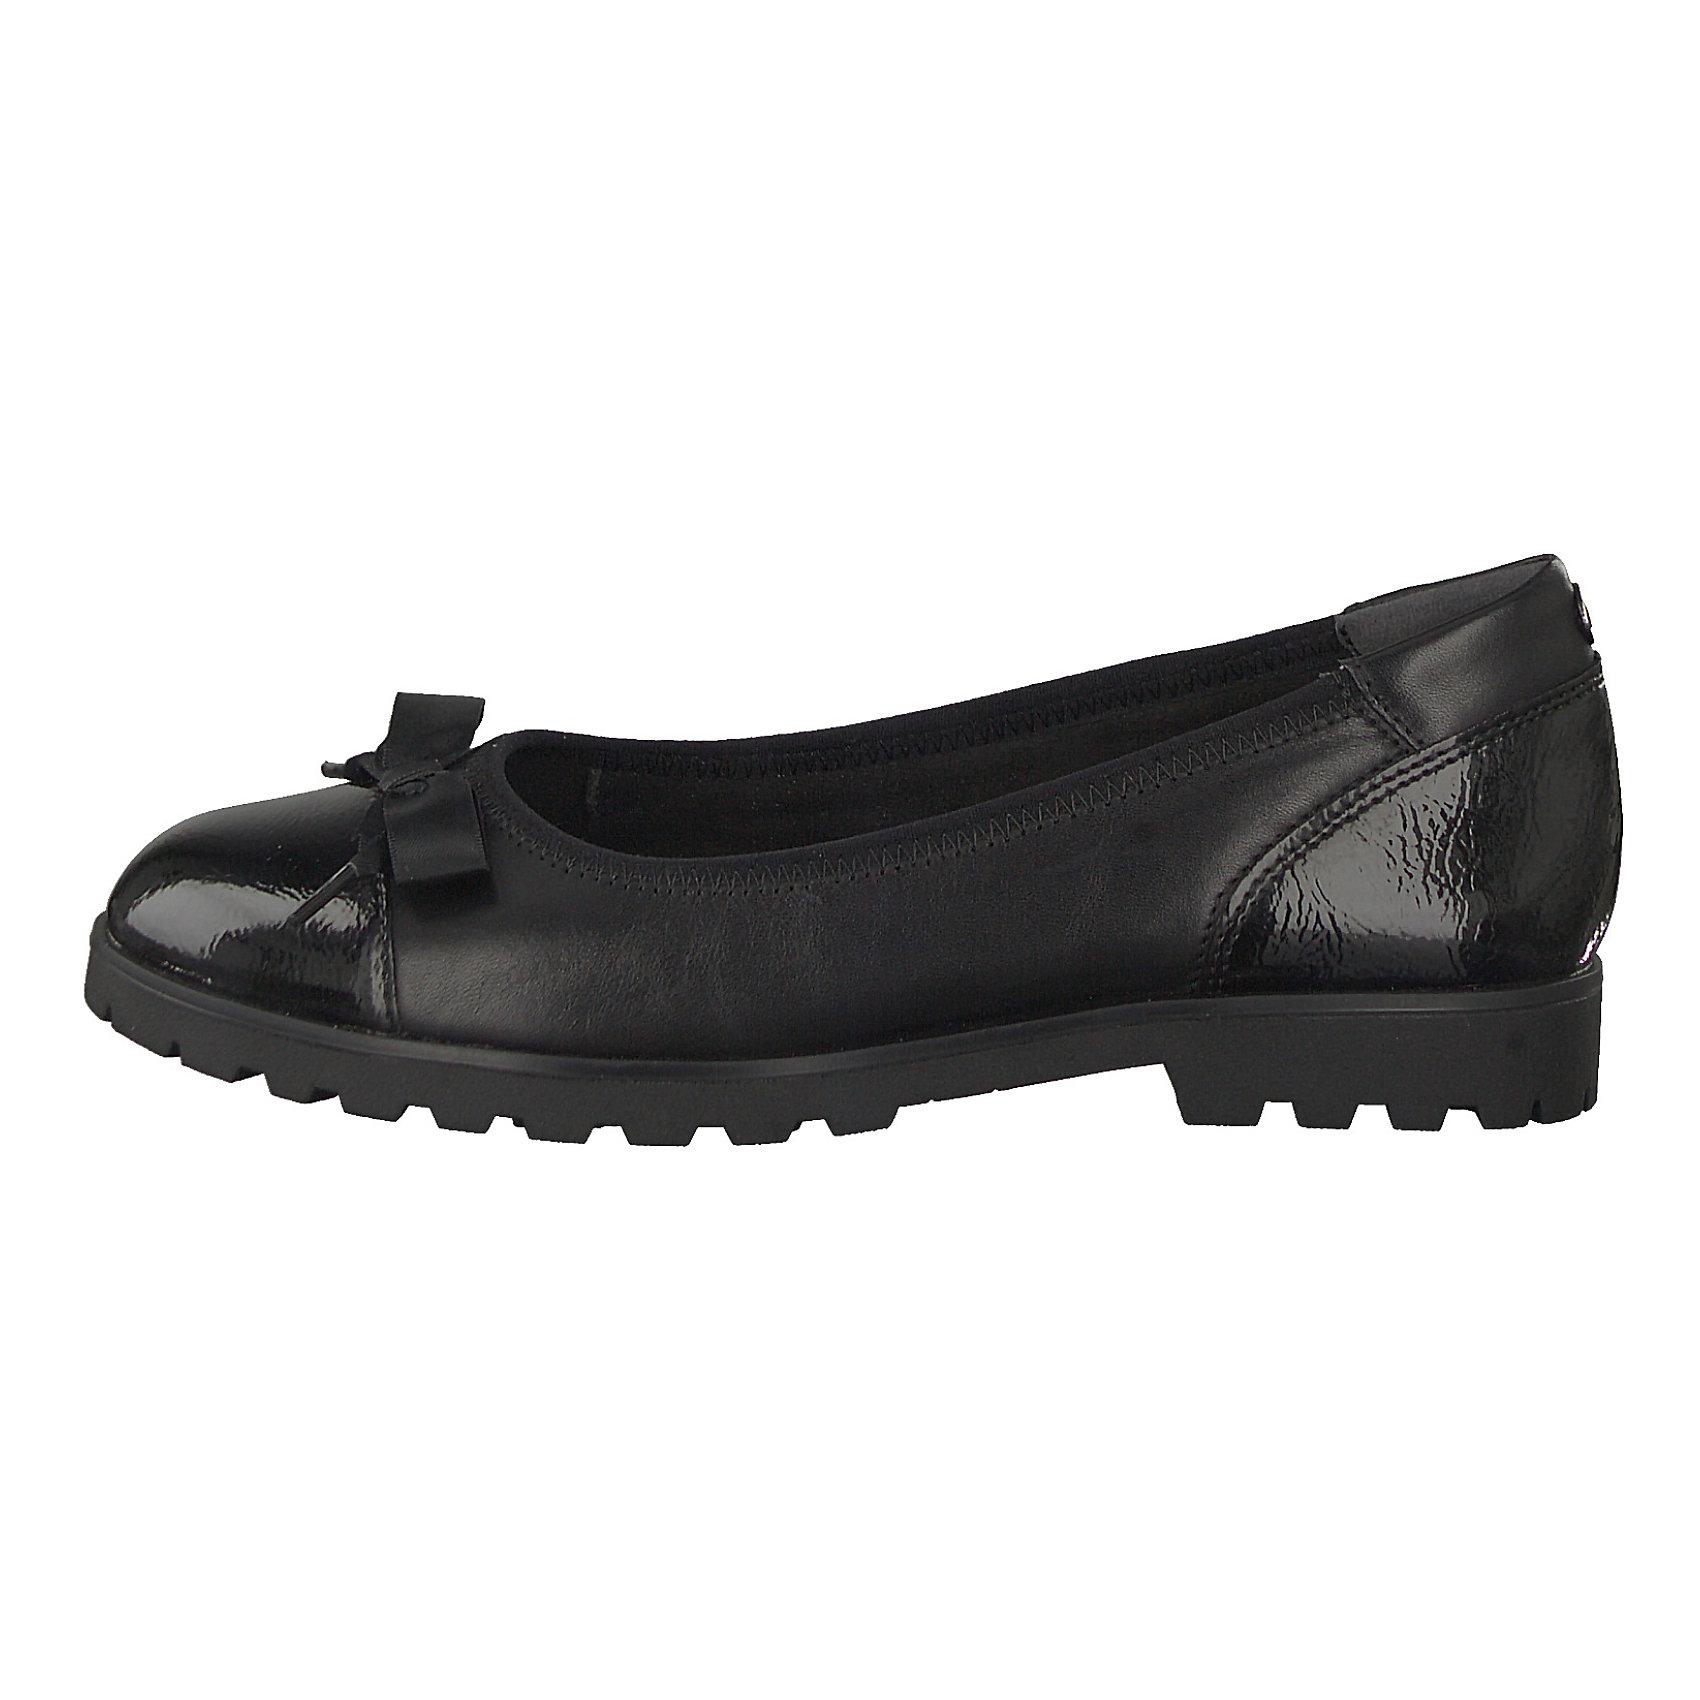 Neu Tamaris Klassische Ballerinas 8453547 für Damen Damen Damen schwarz ca4822